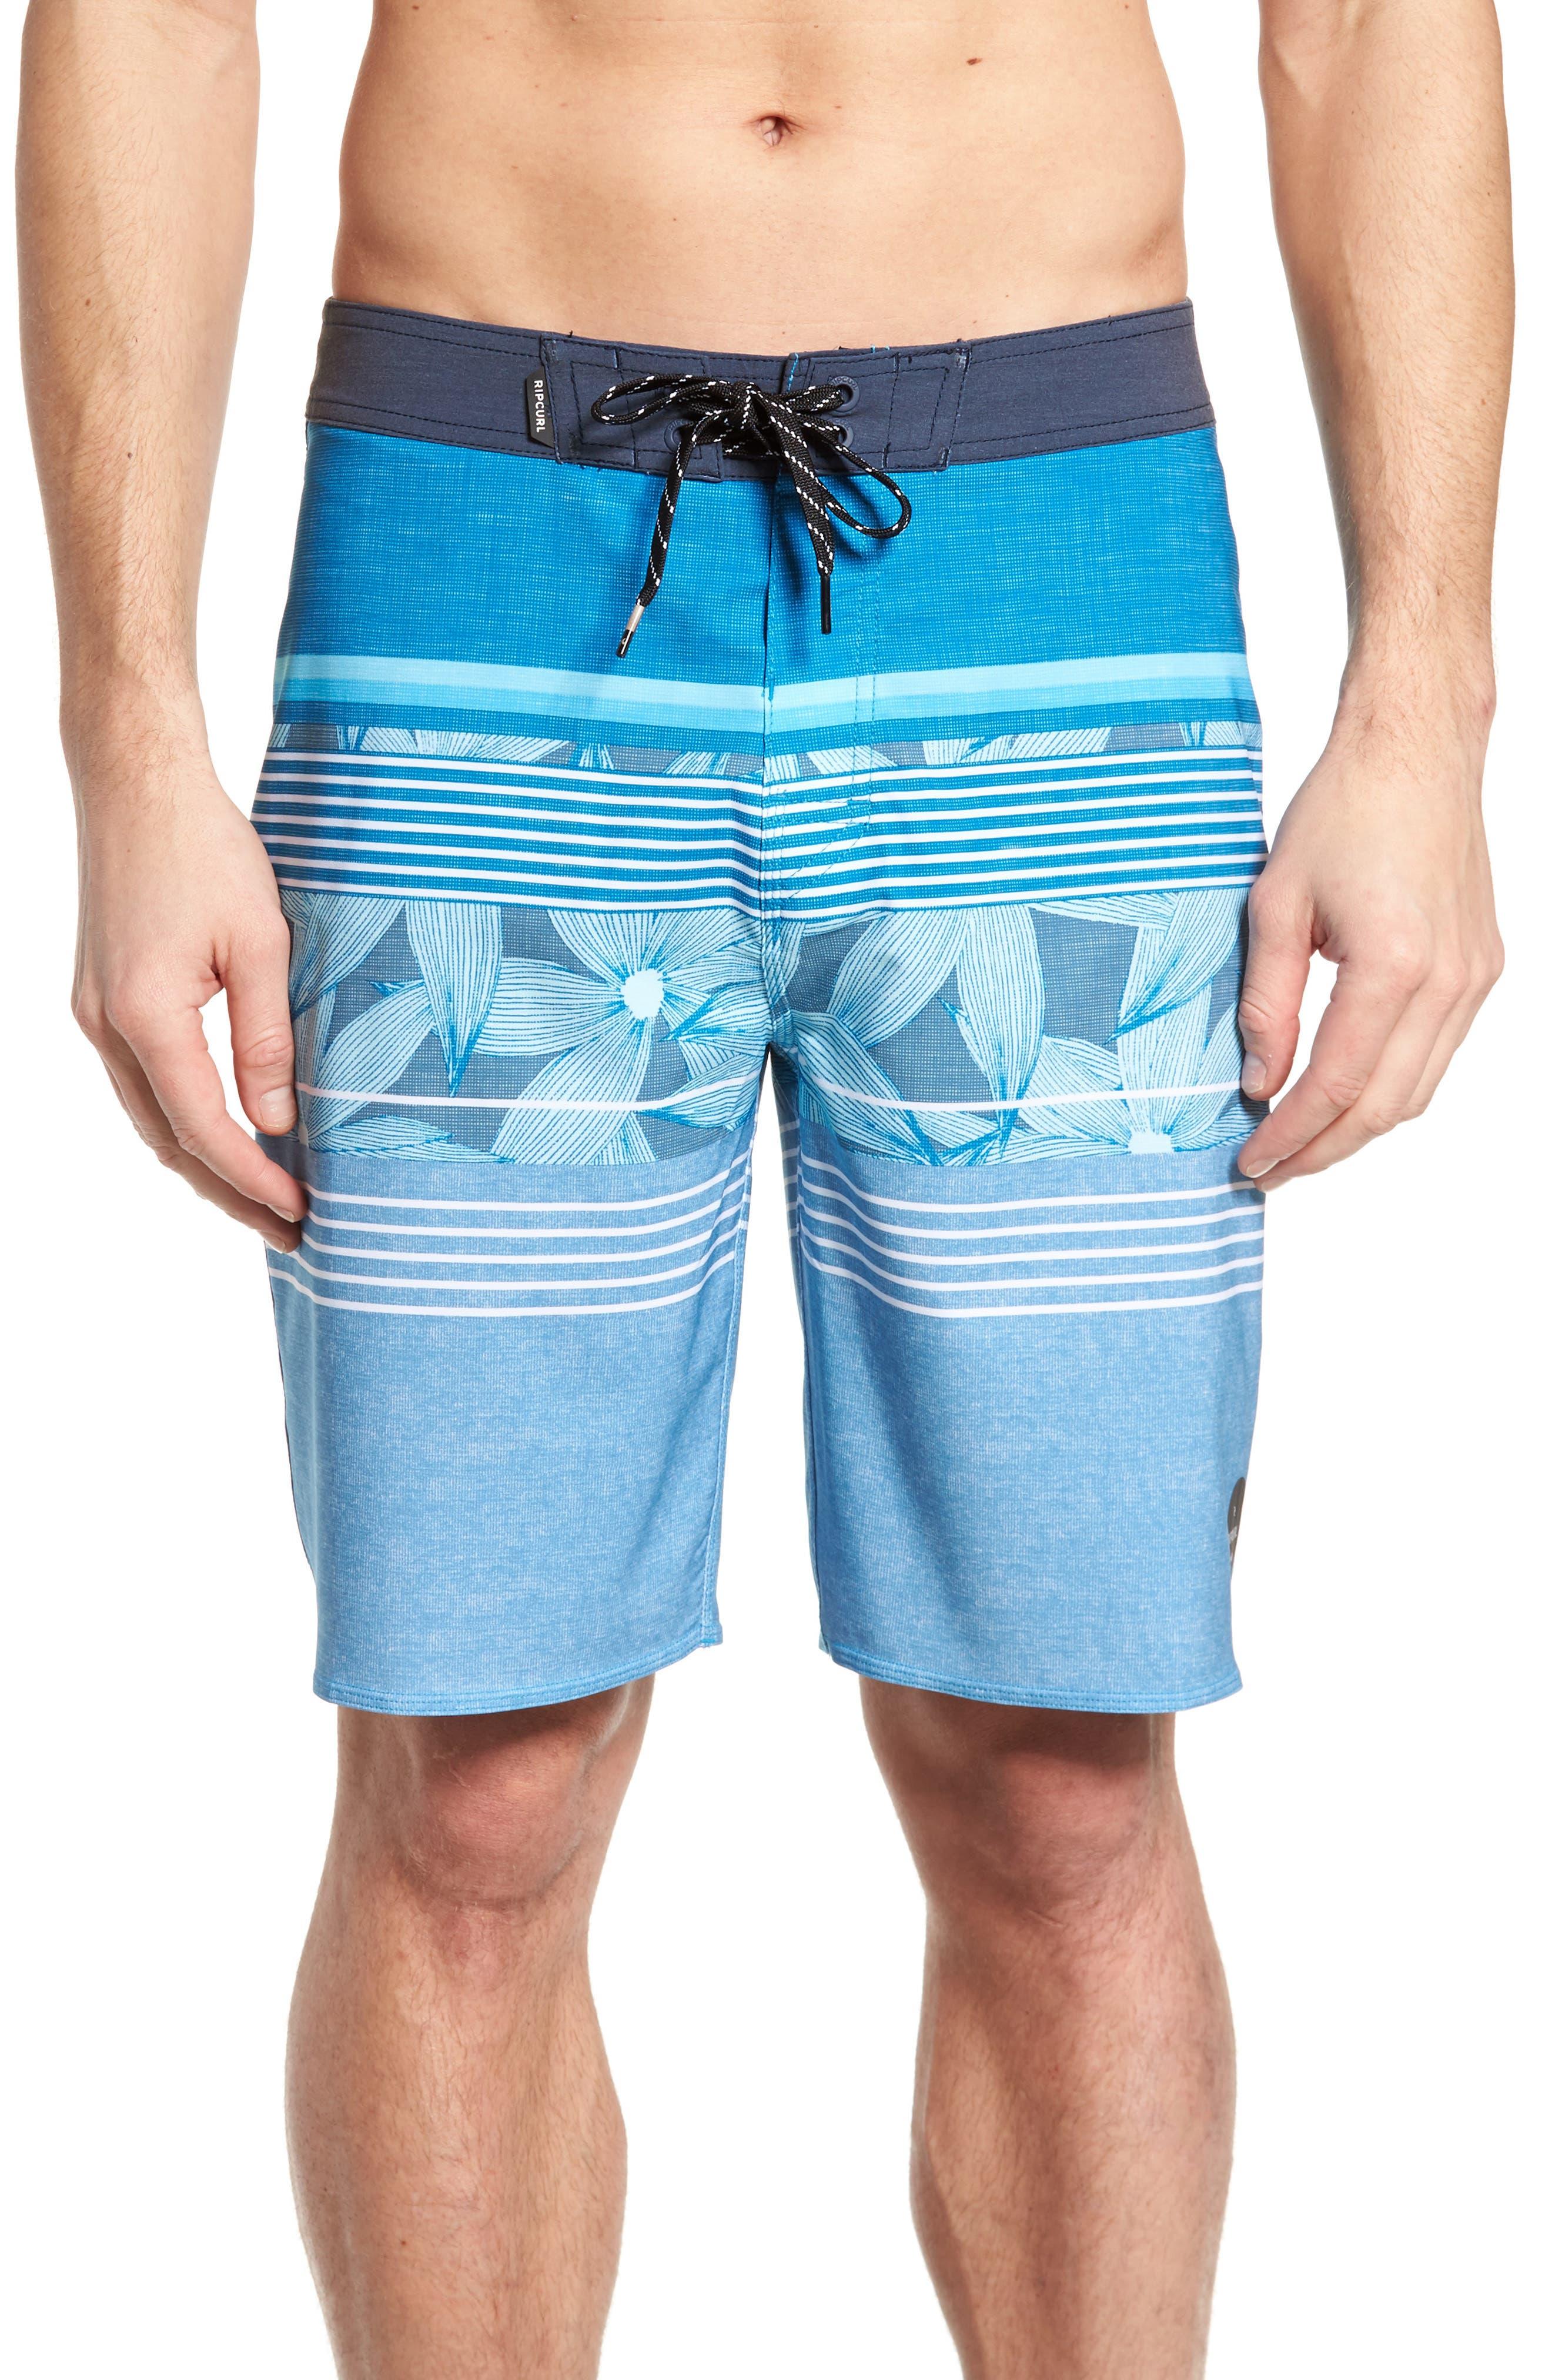 Alternate Image 1 Selected - Rip Curl Mirage Shake Up Board Shorts